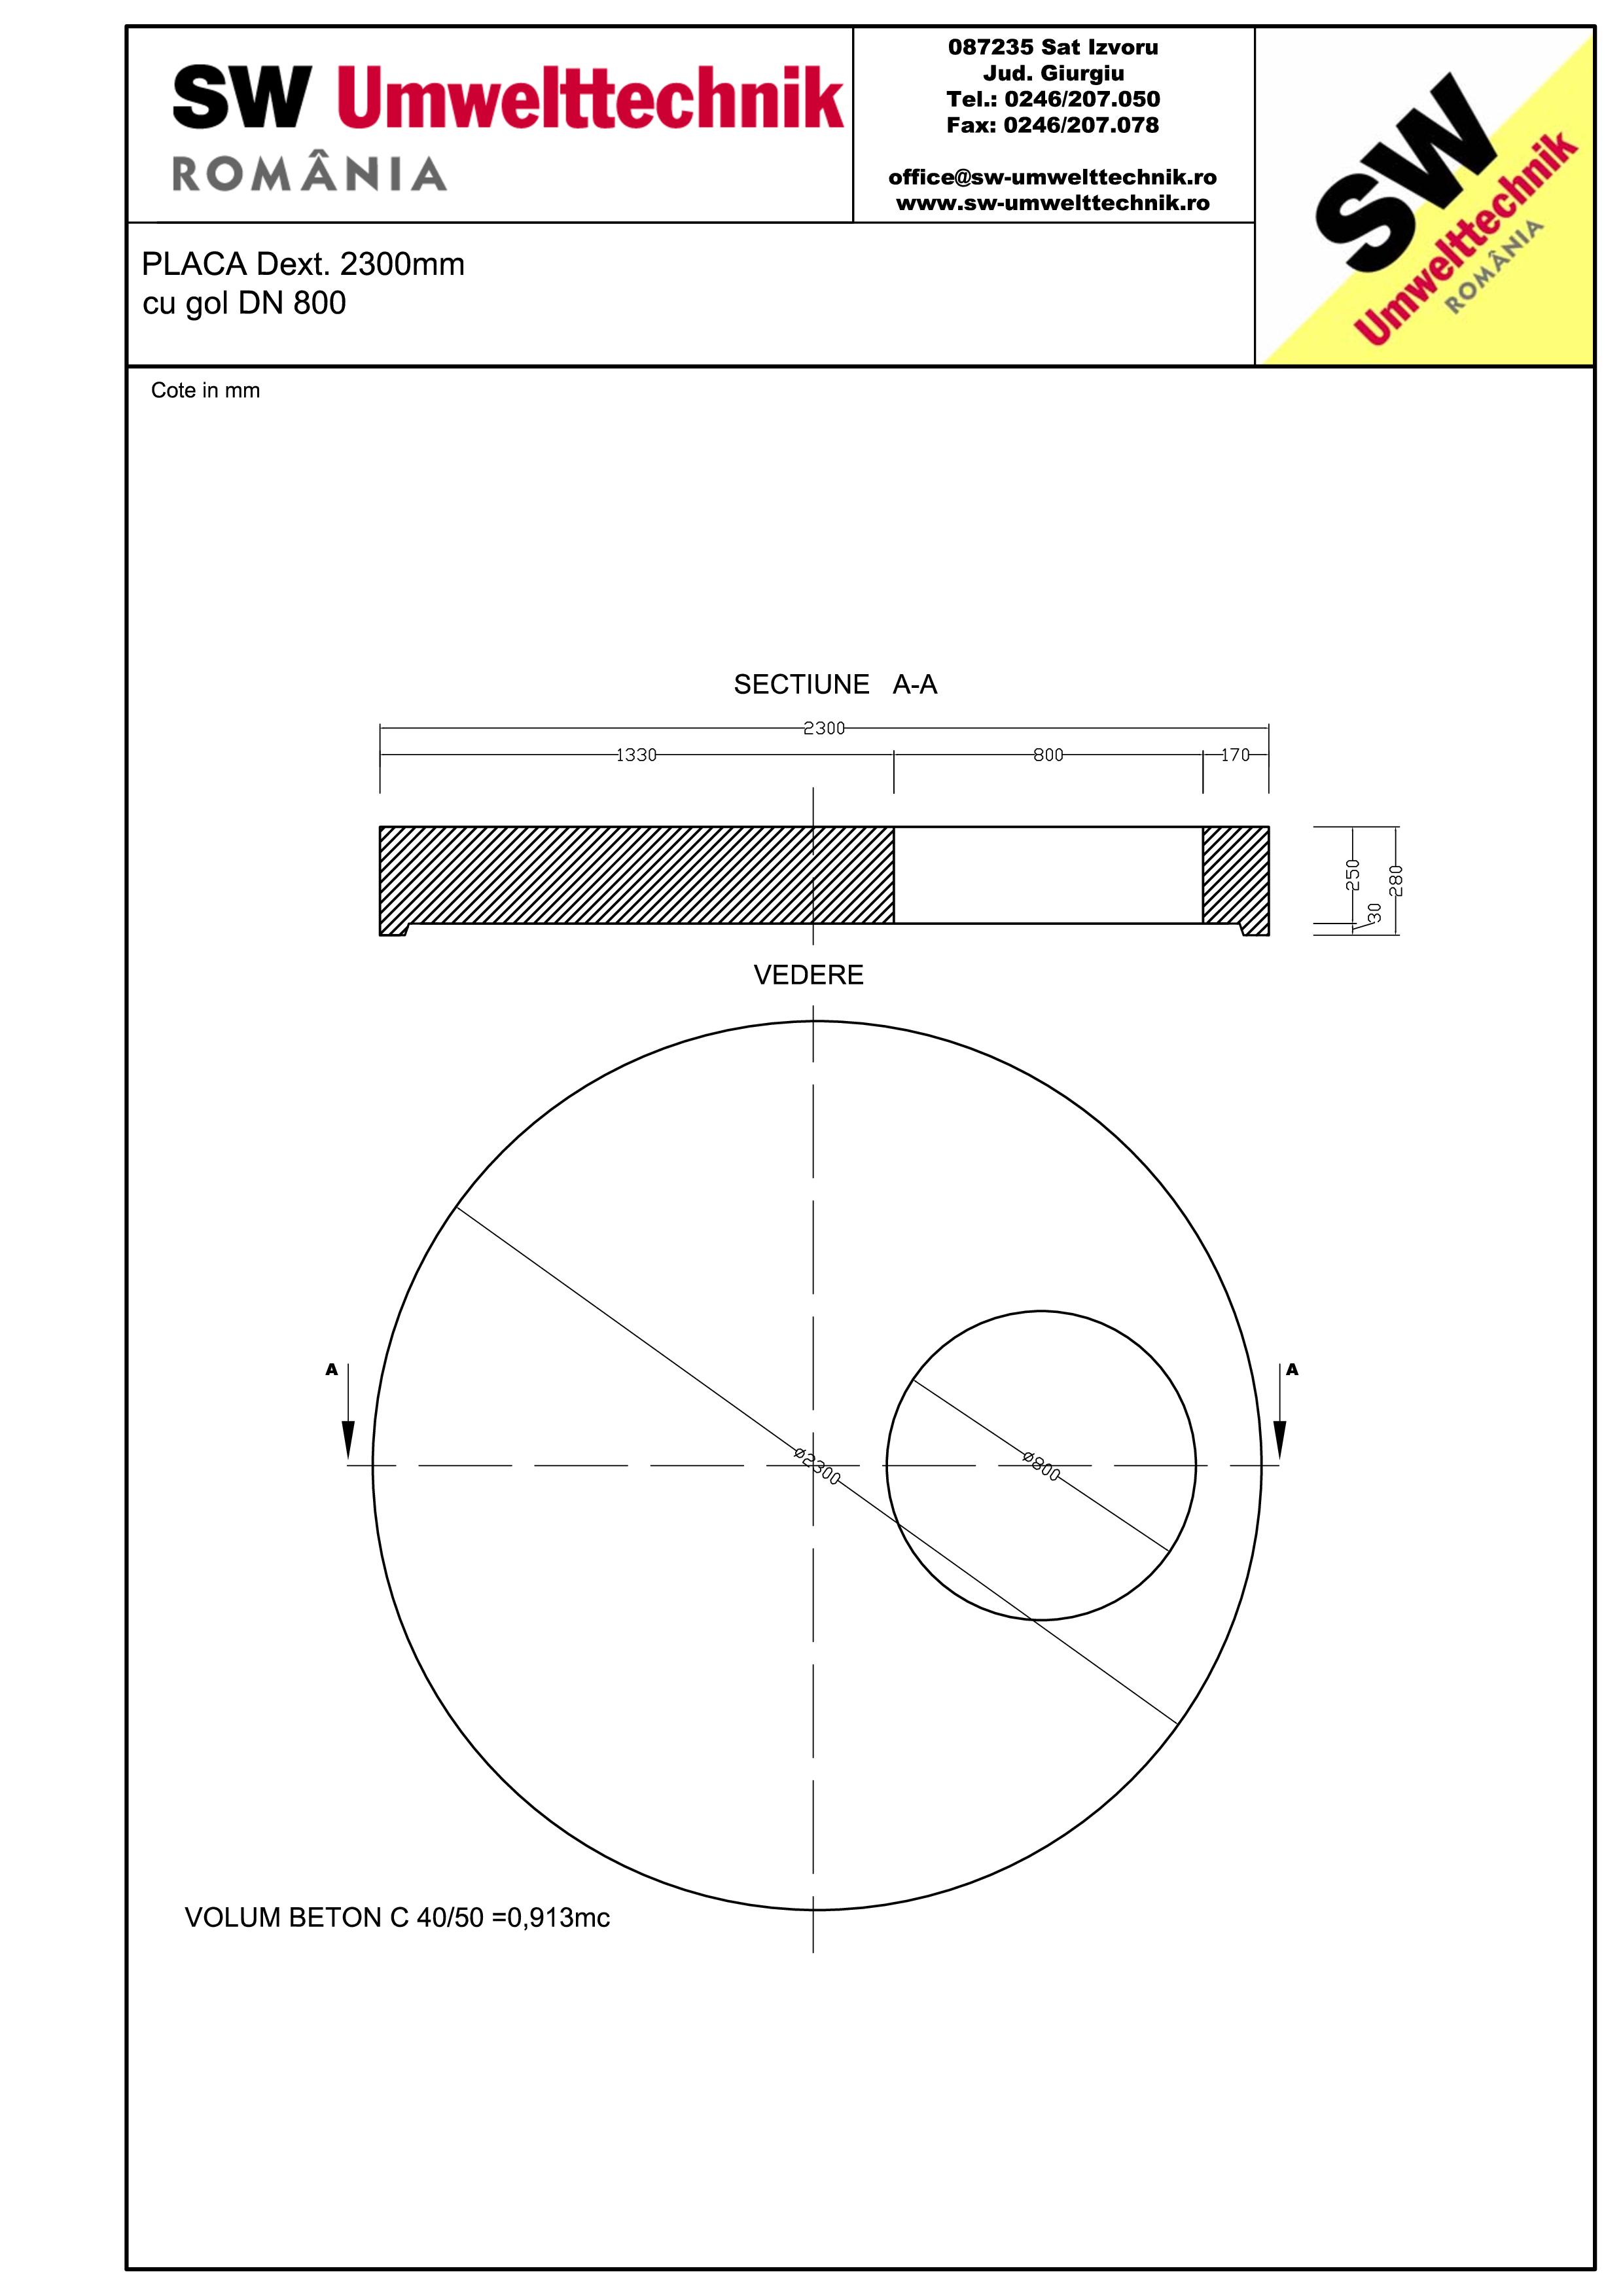 Pagina 1 - CAD-PDF Placa Dext.2300 H250 cu gol DN800 SW UMWELTTECHNIK Detaliu de produs